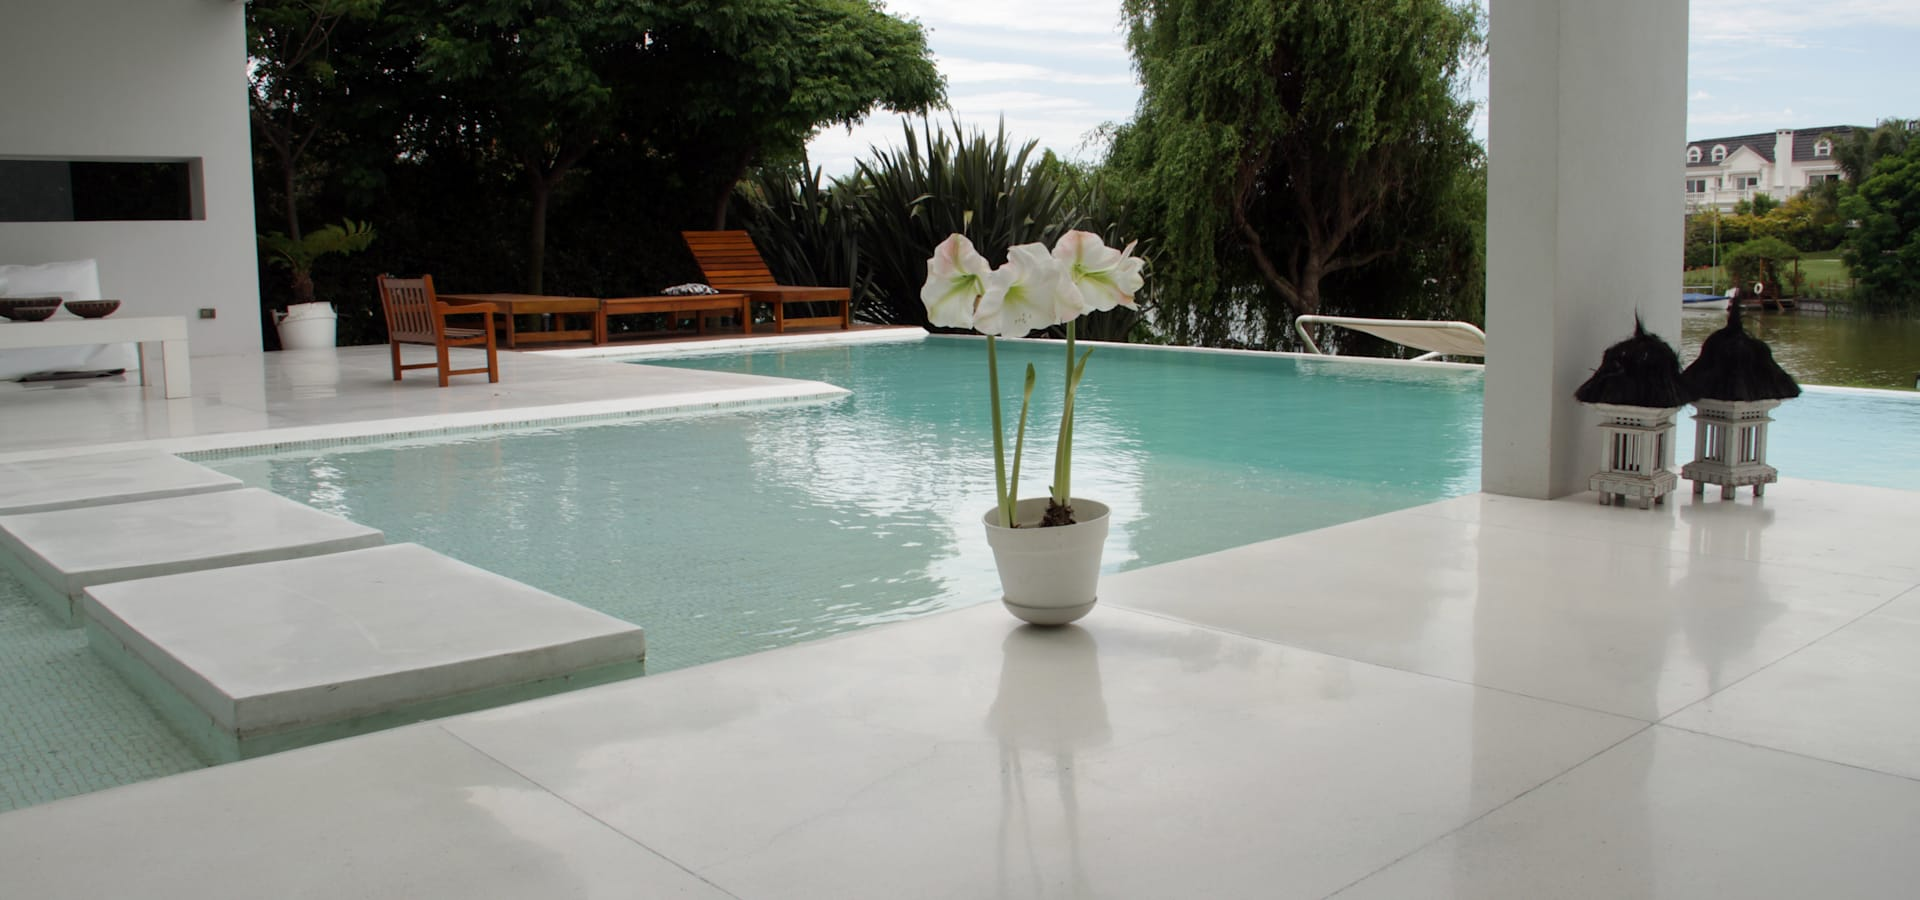 Piscina nocturnas by parquearte piscinas como iconos de - Diseno de piscinas ...